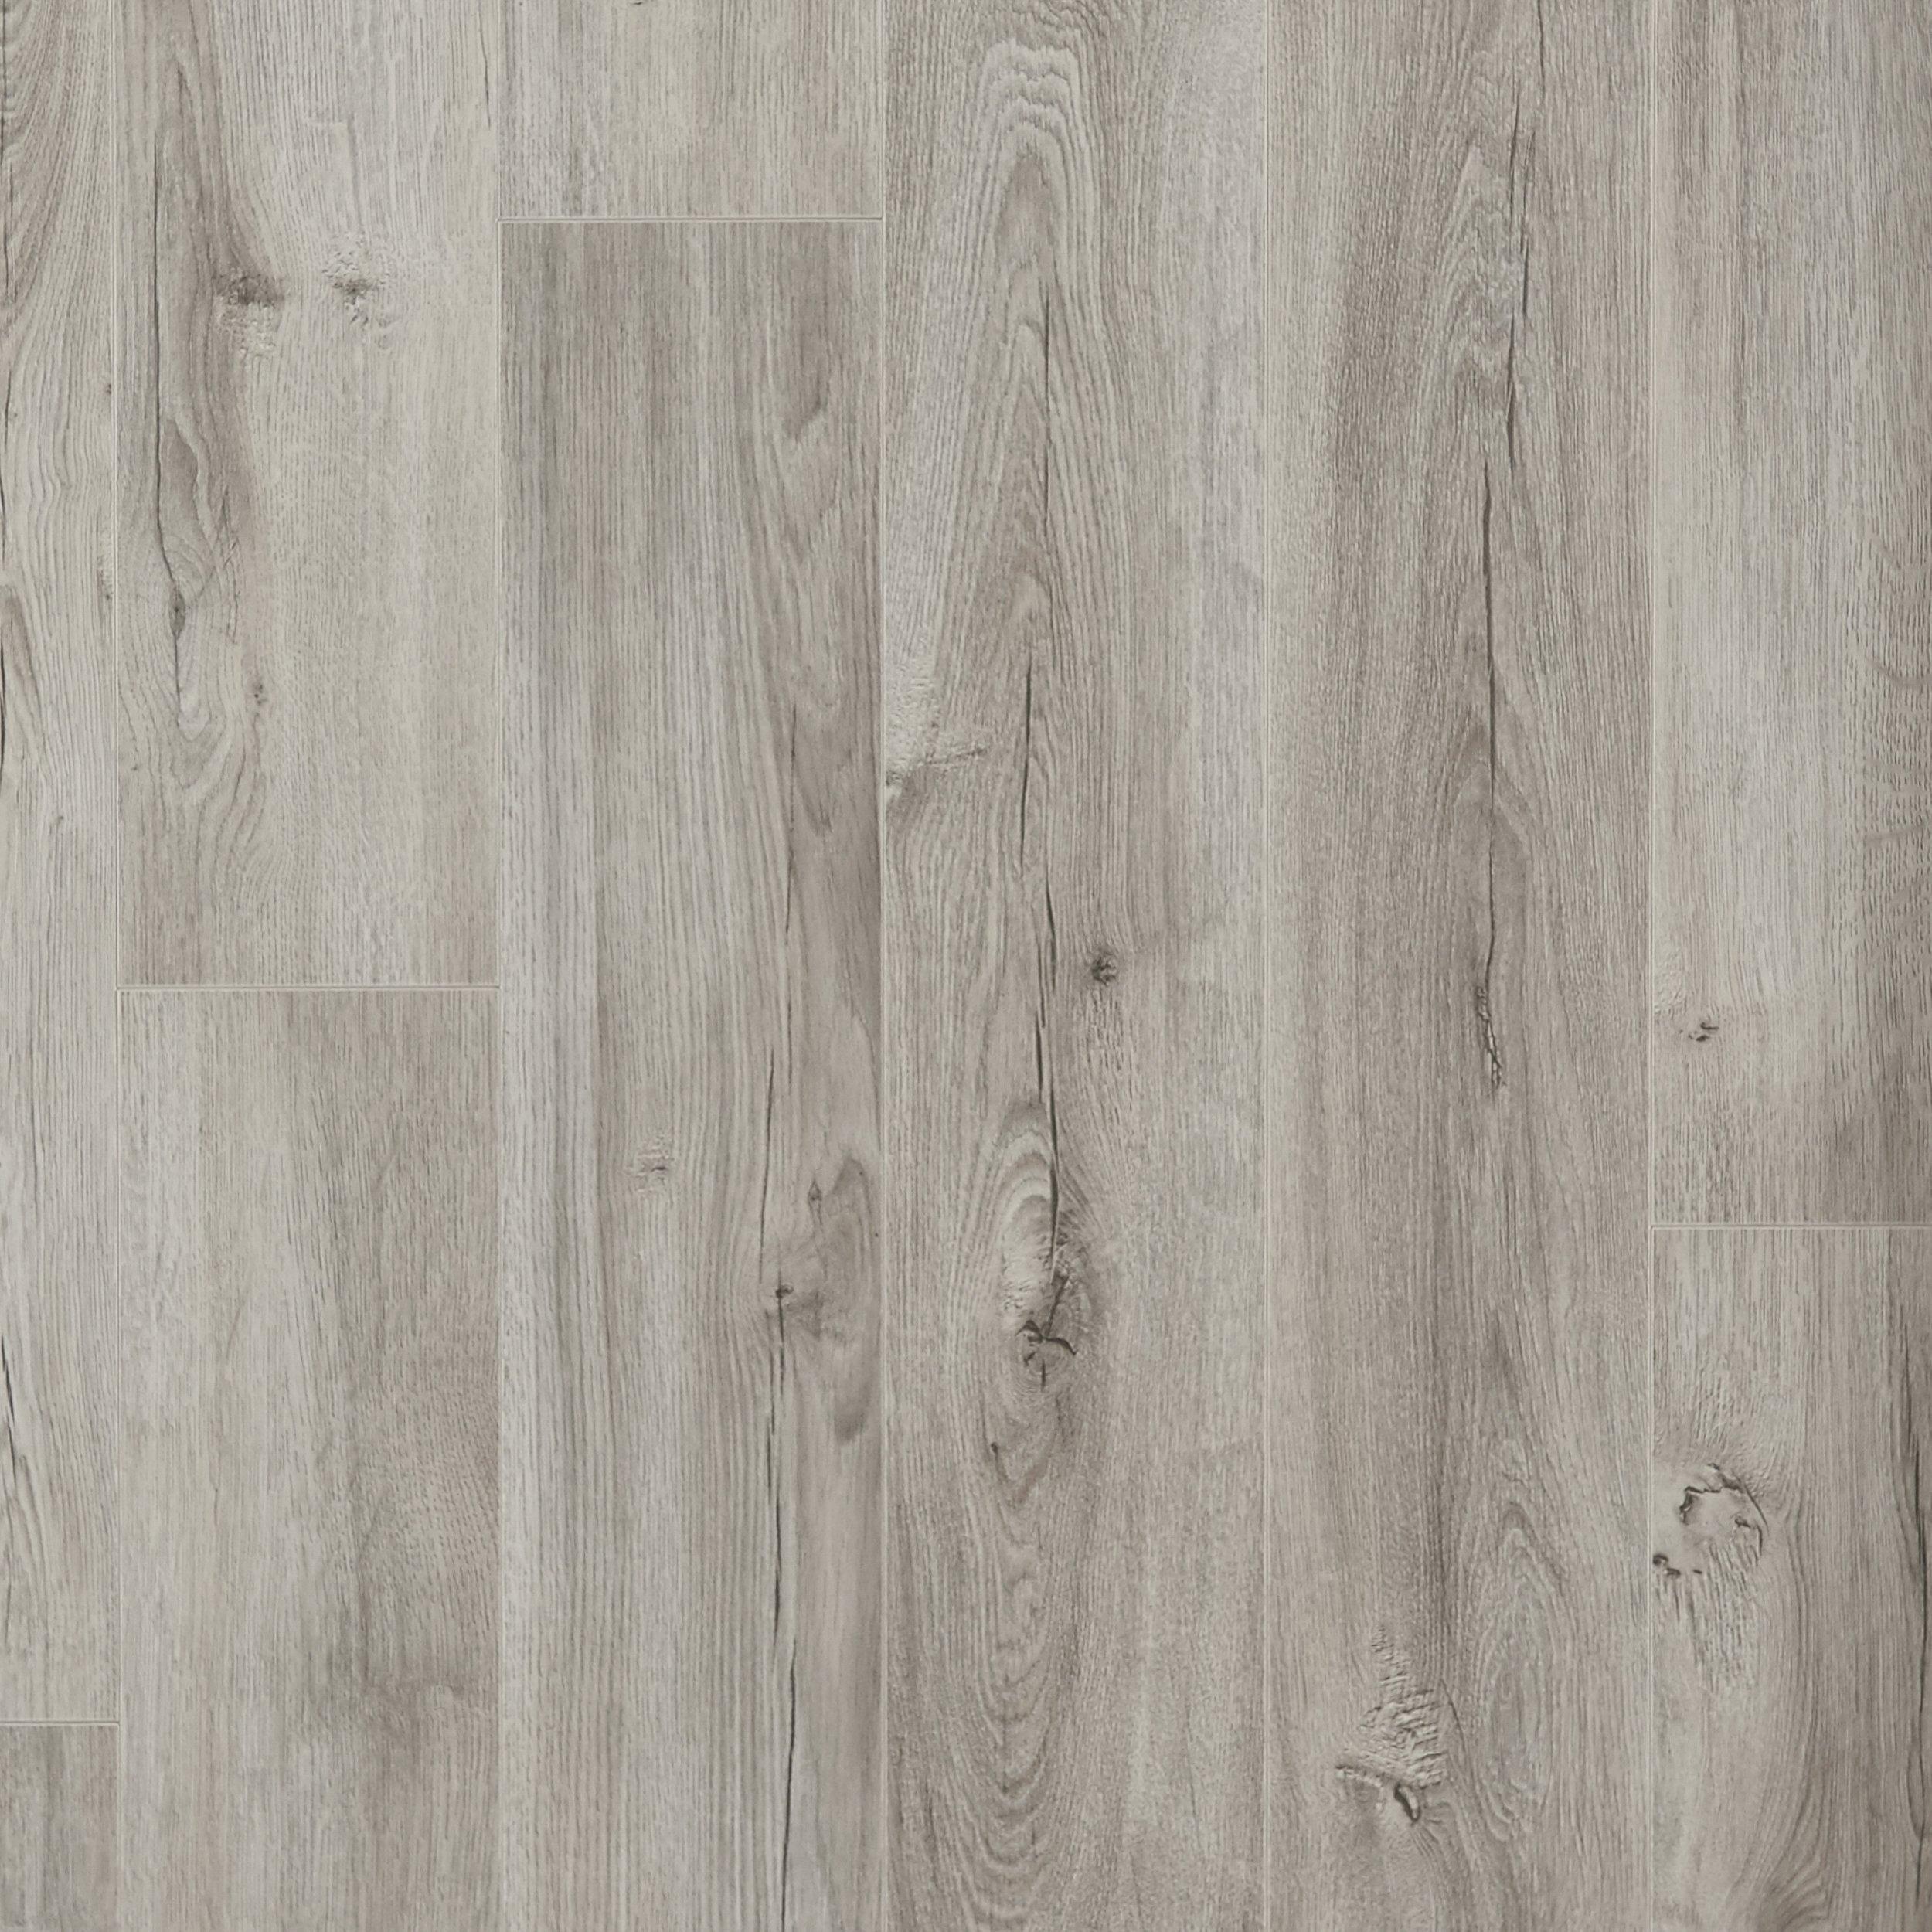 Silverado Oak Embossed In Register Laminate Products